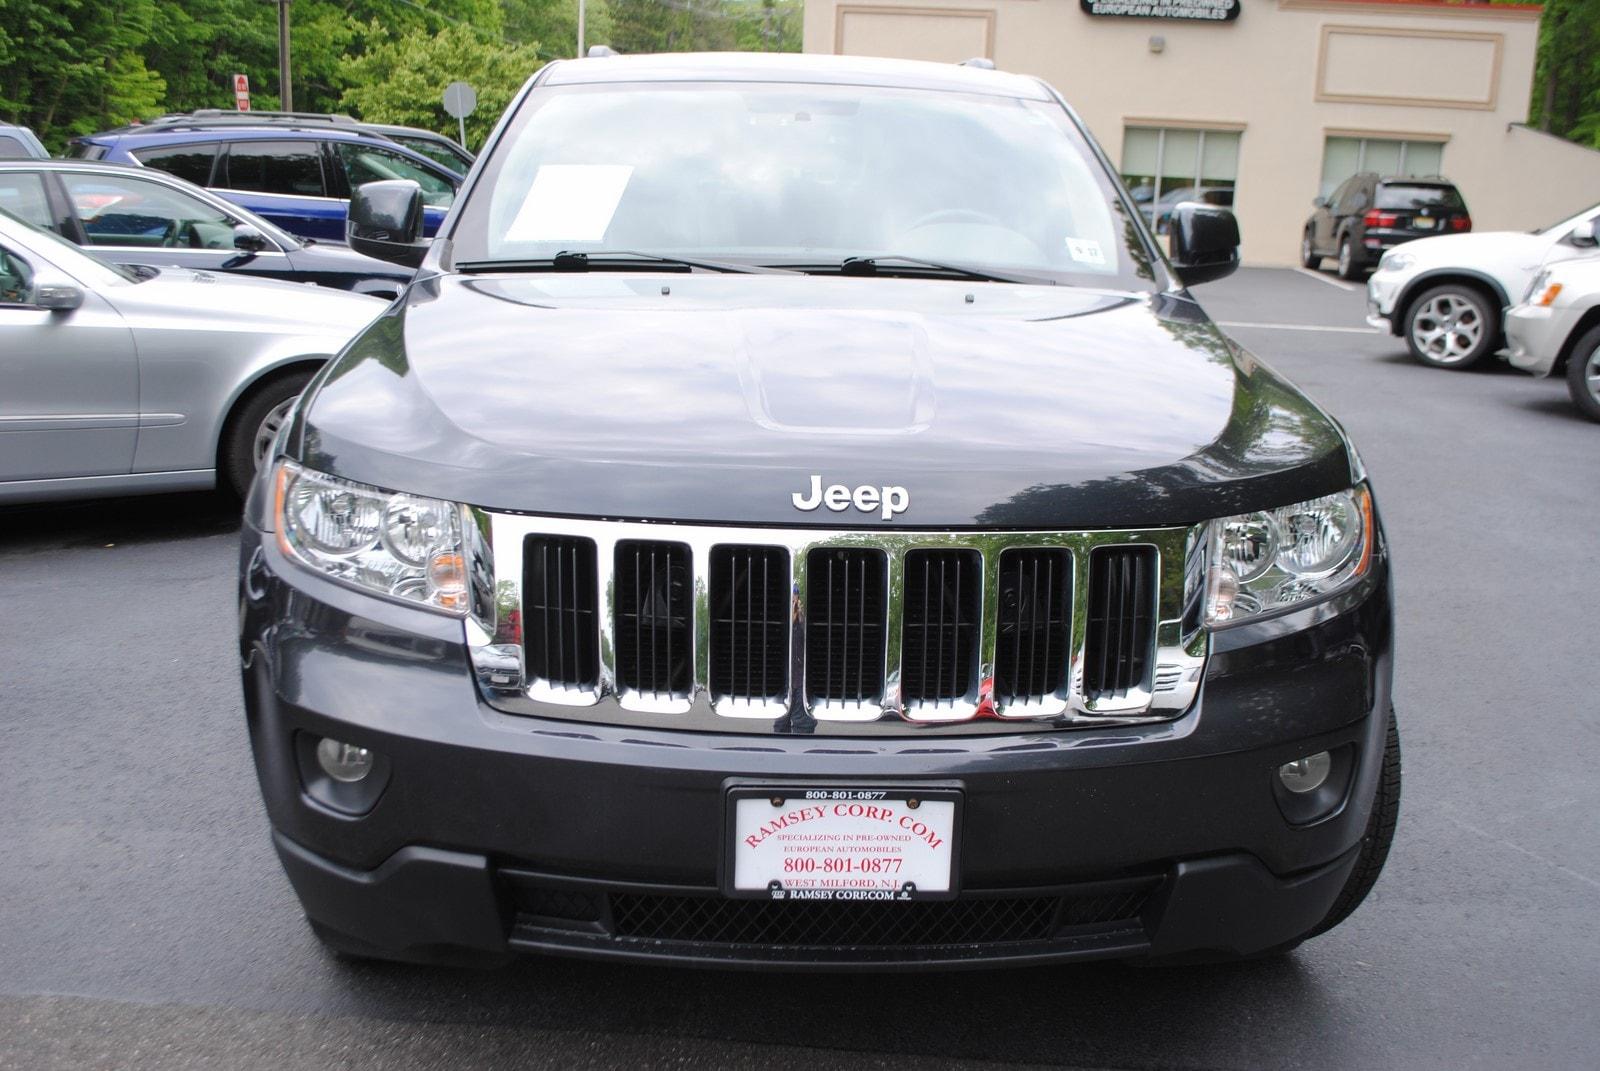 used 2012 jeep grand cherokee for sale west milford nj. Black Bedroom Furniture Sets. Home Design Ideas